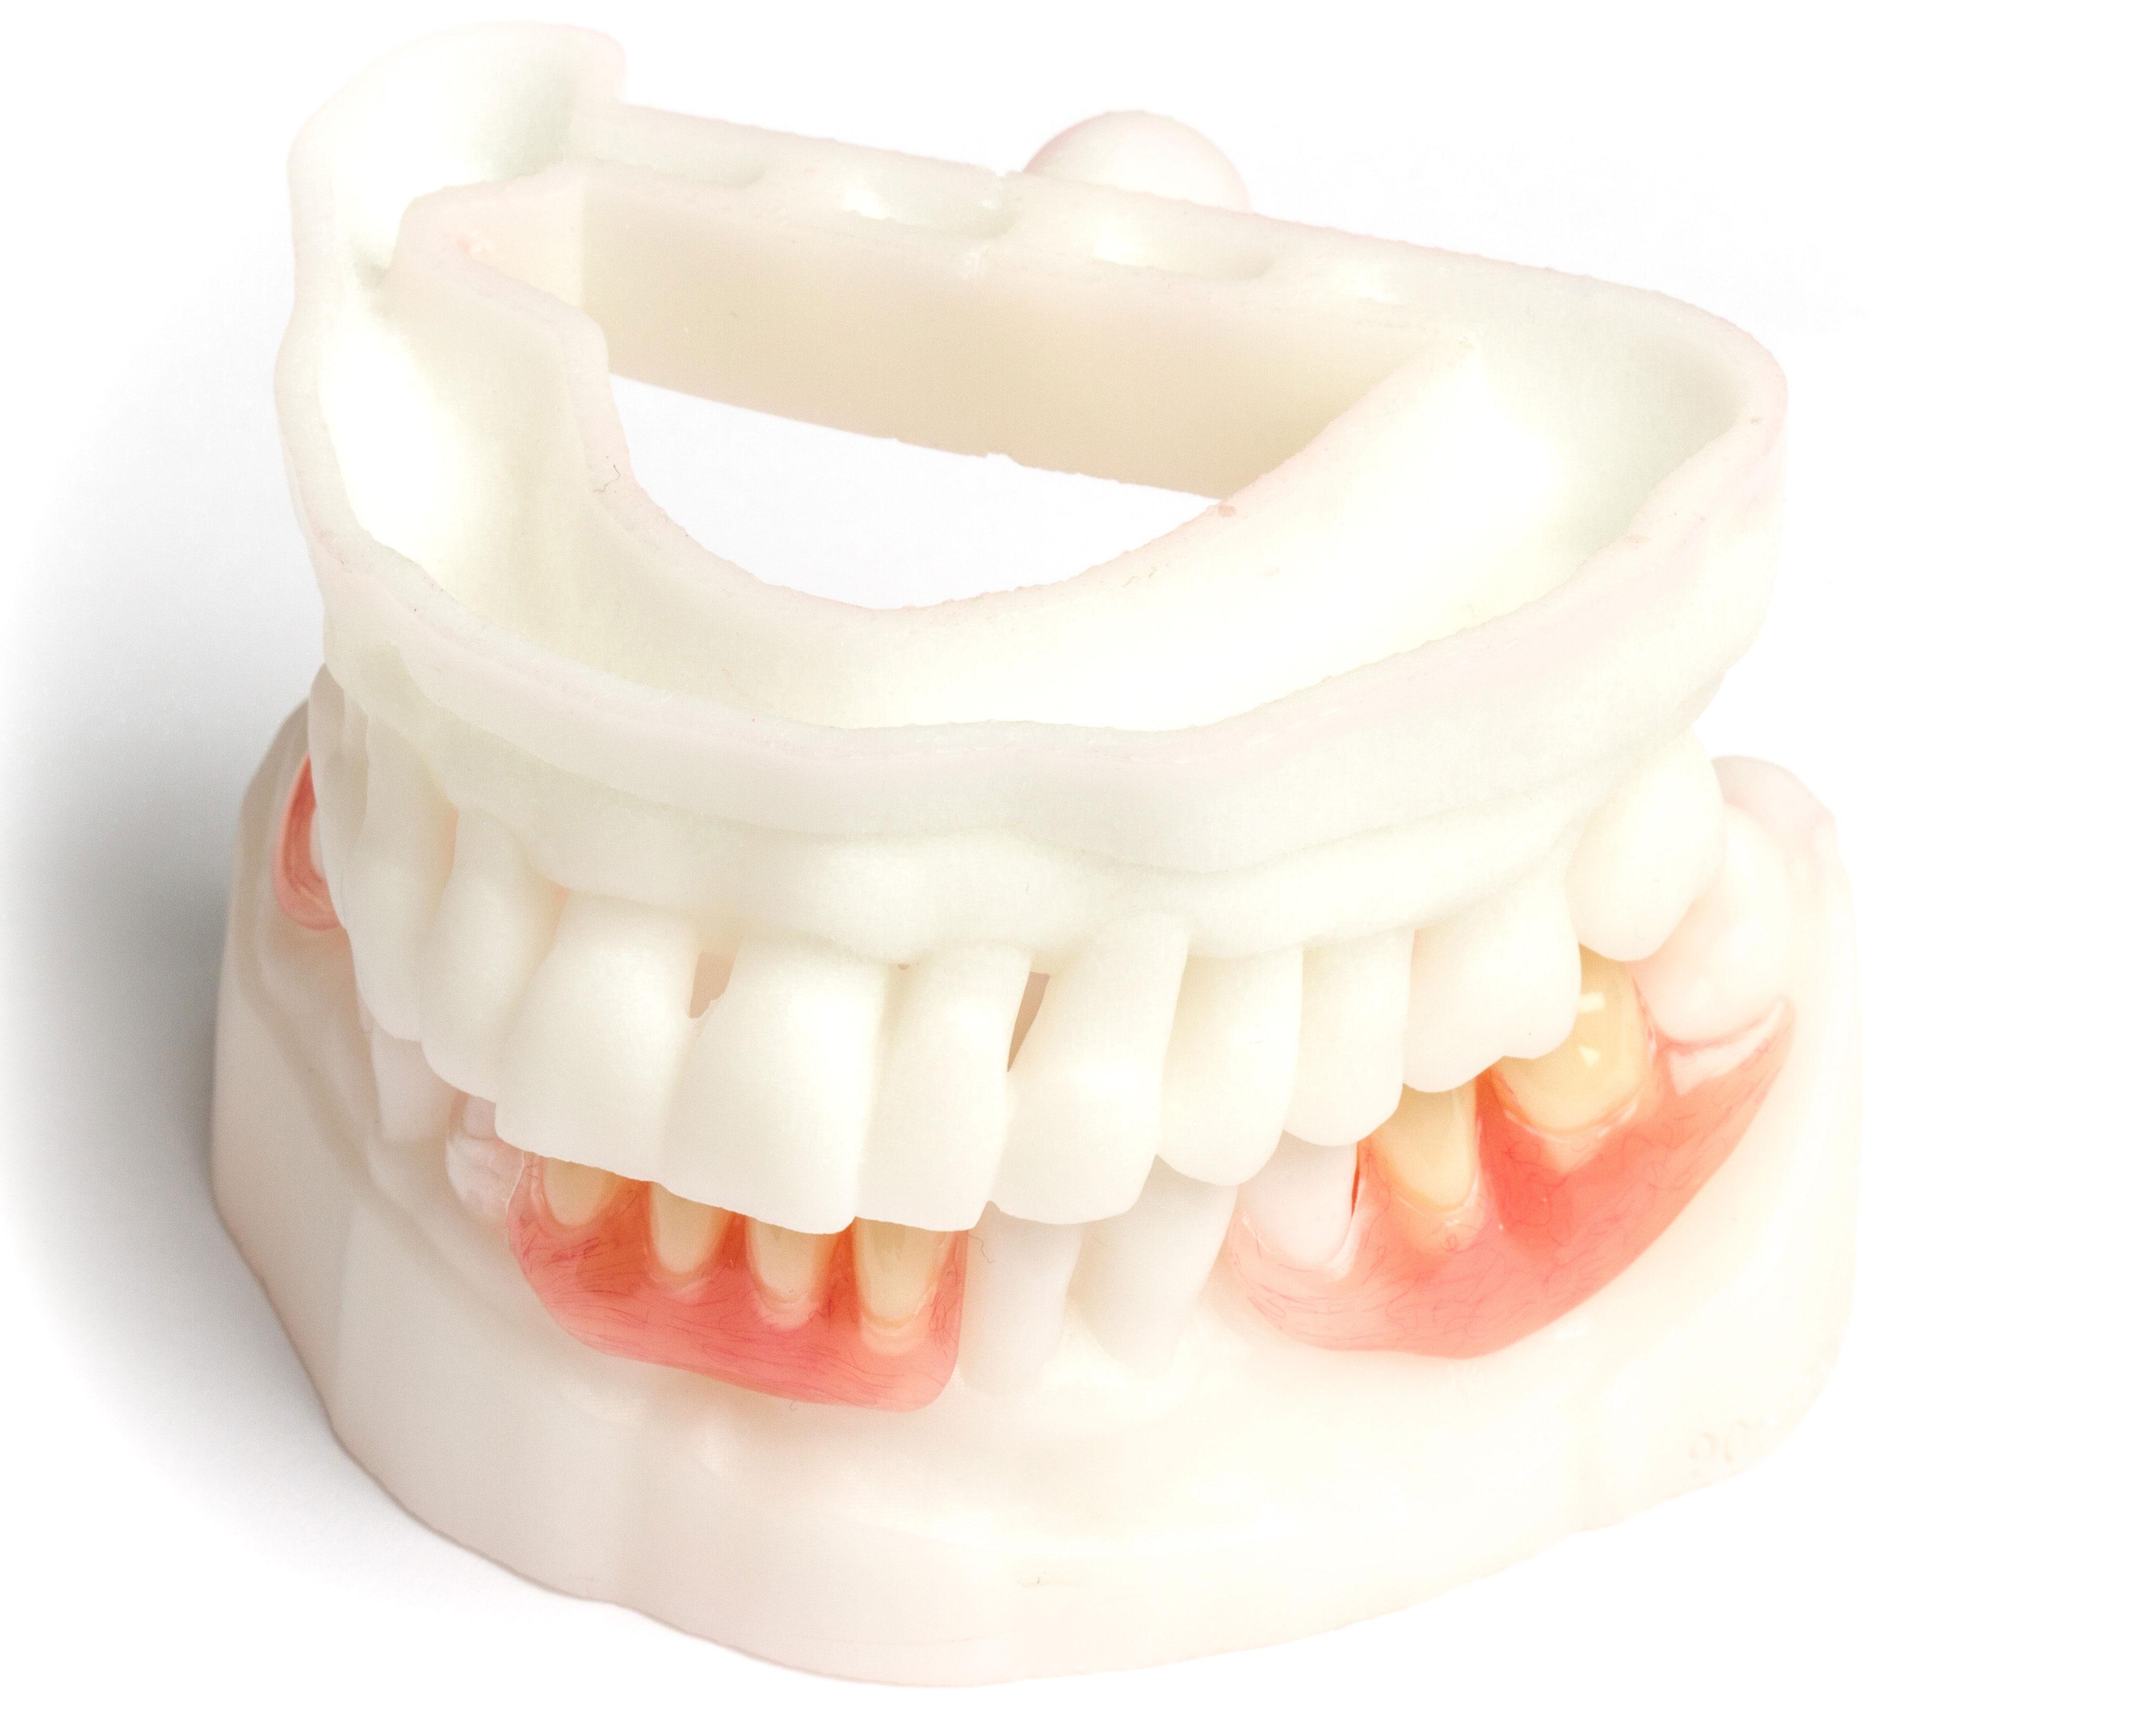 partial denture and 3d printed models